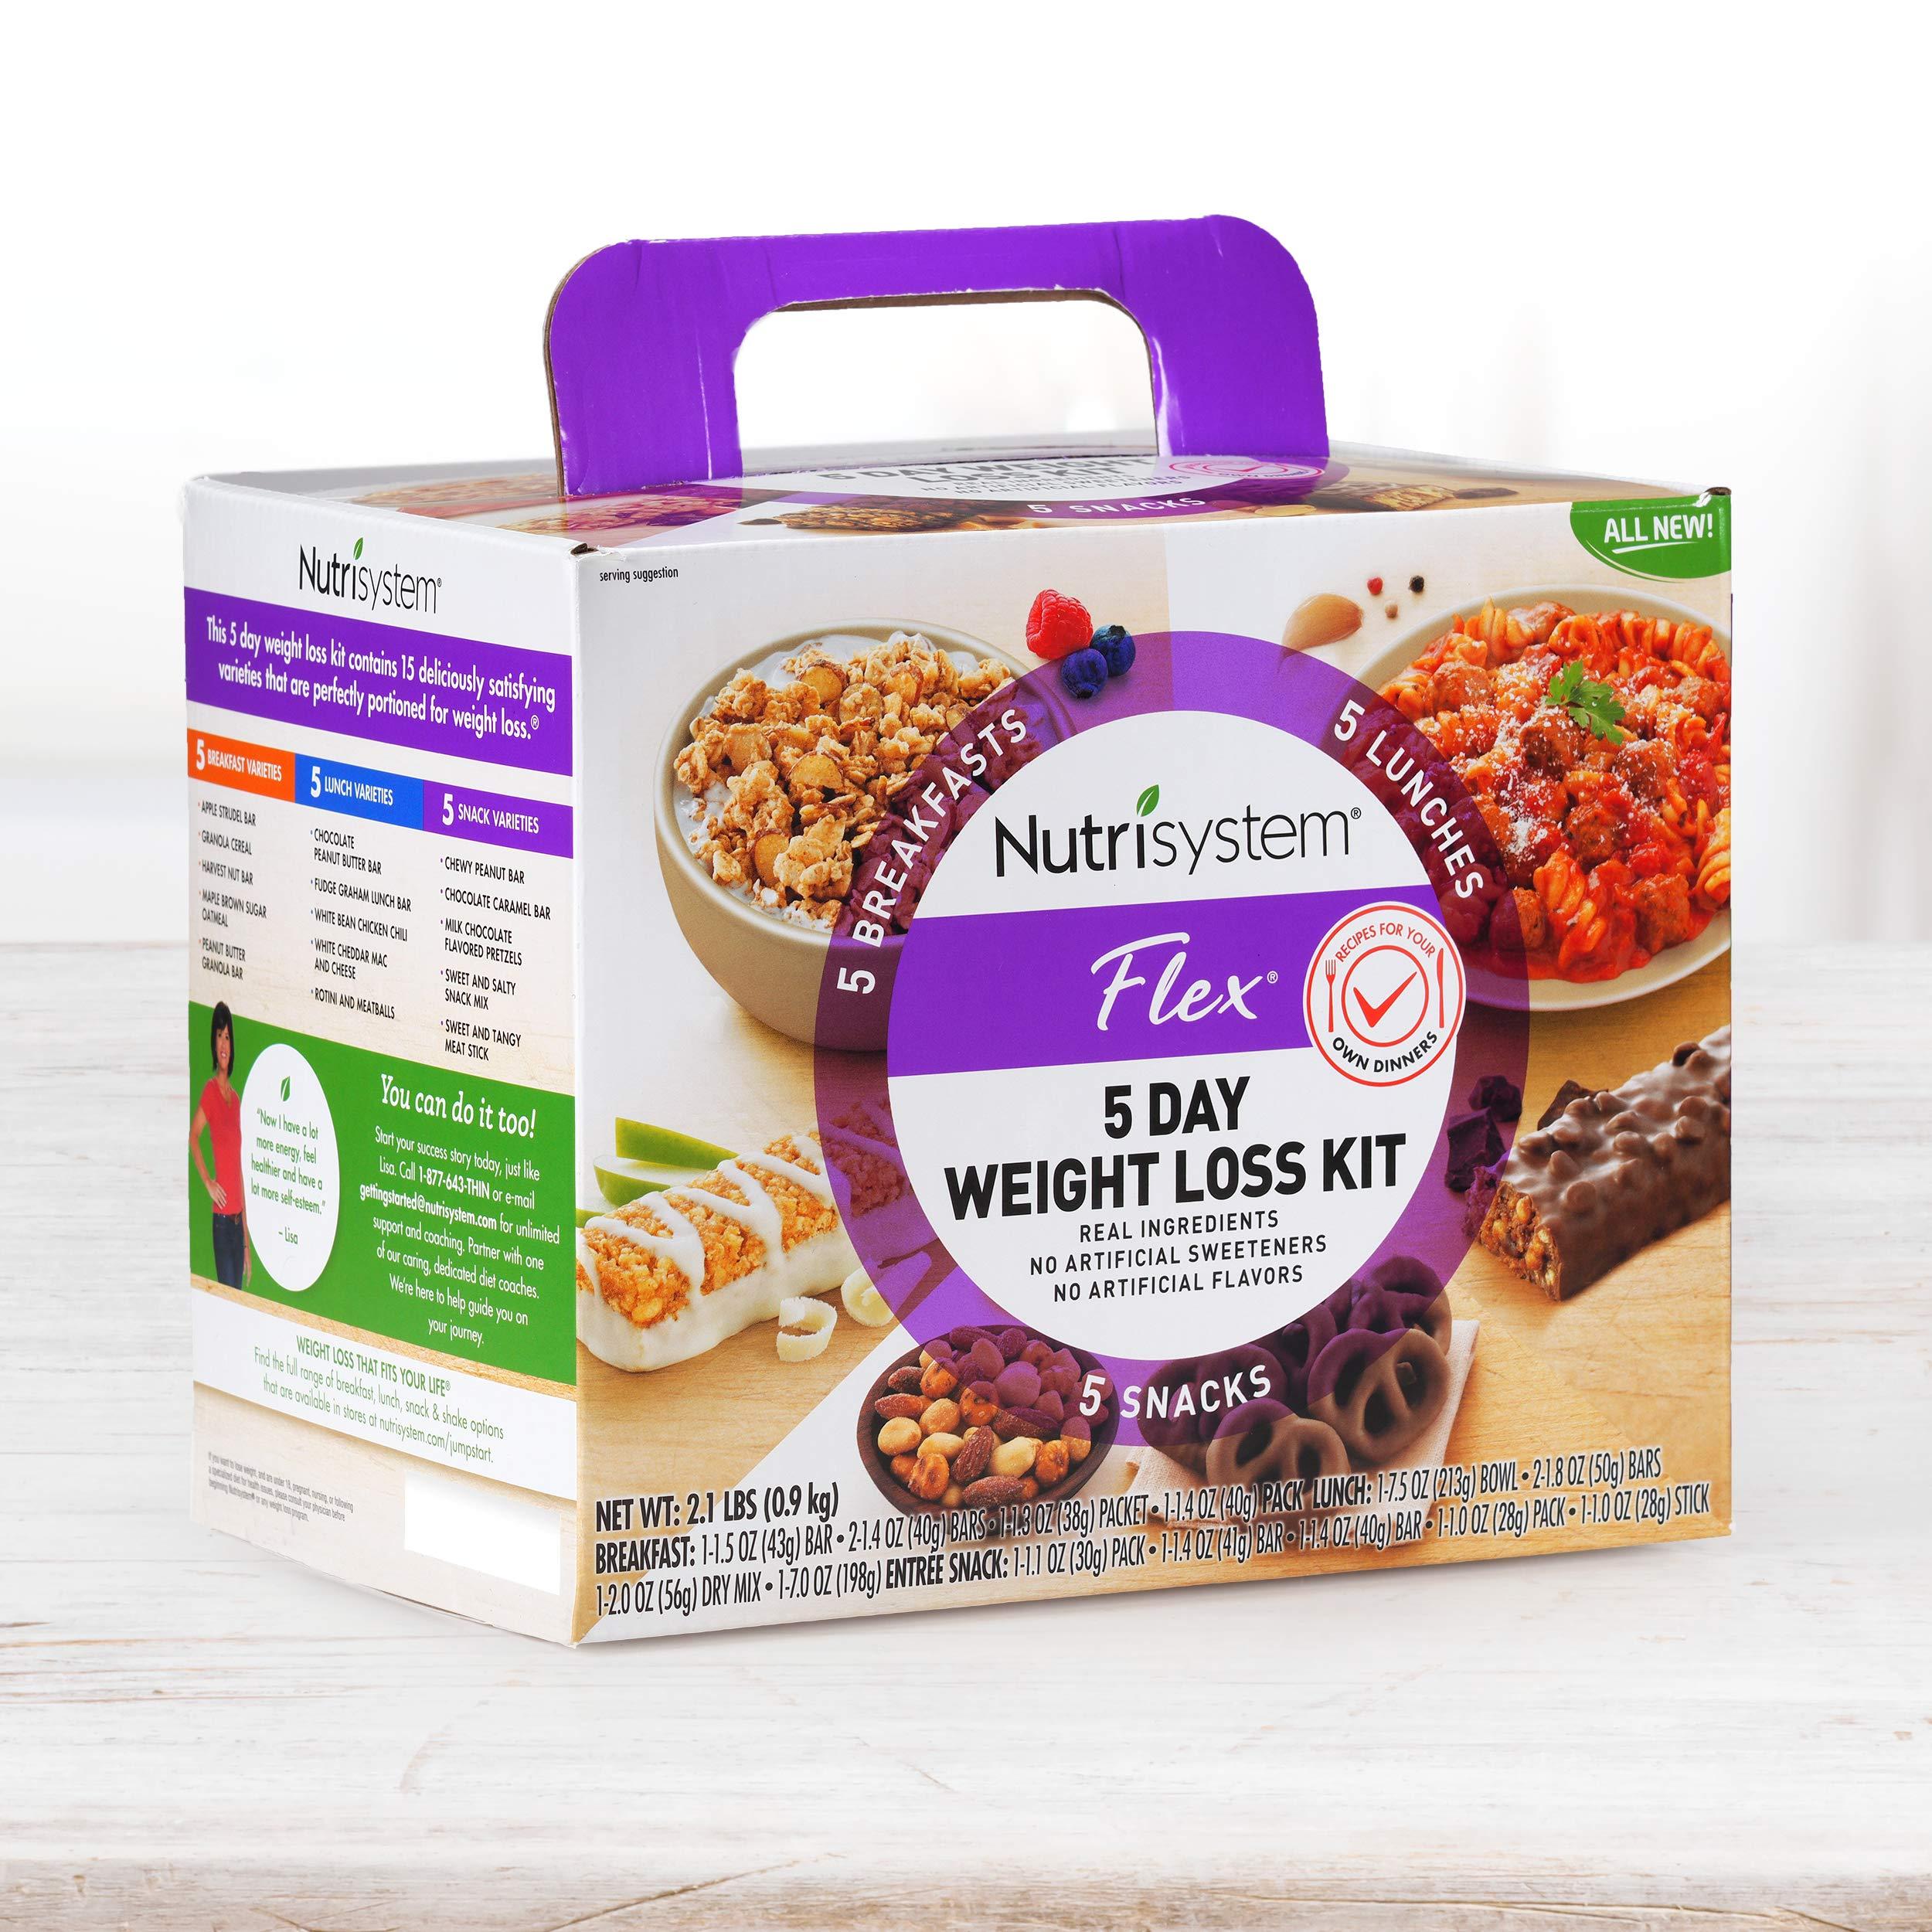 Nutrisystem® Flex 5 Day Weight Loss Kit by Nutrisystem